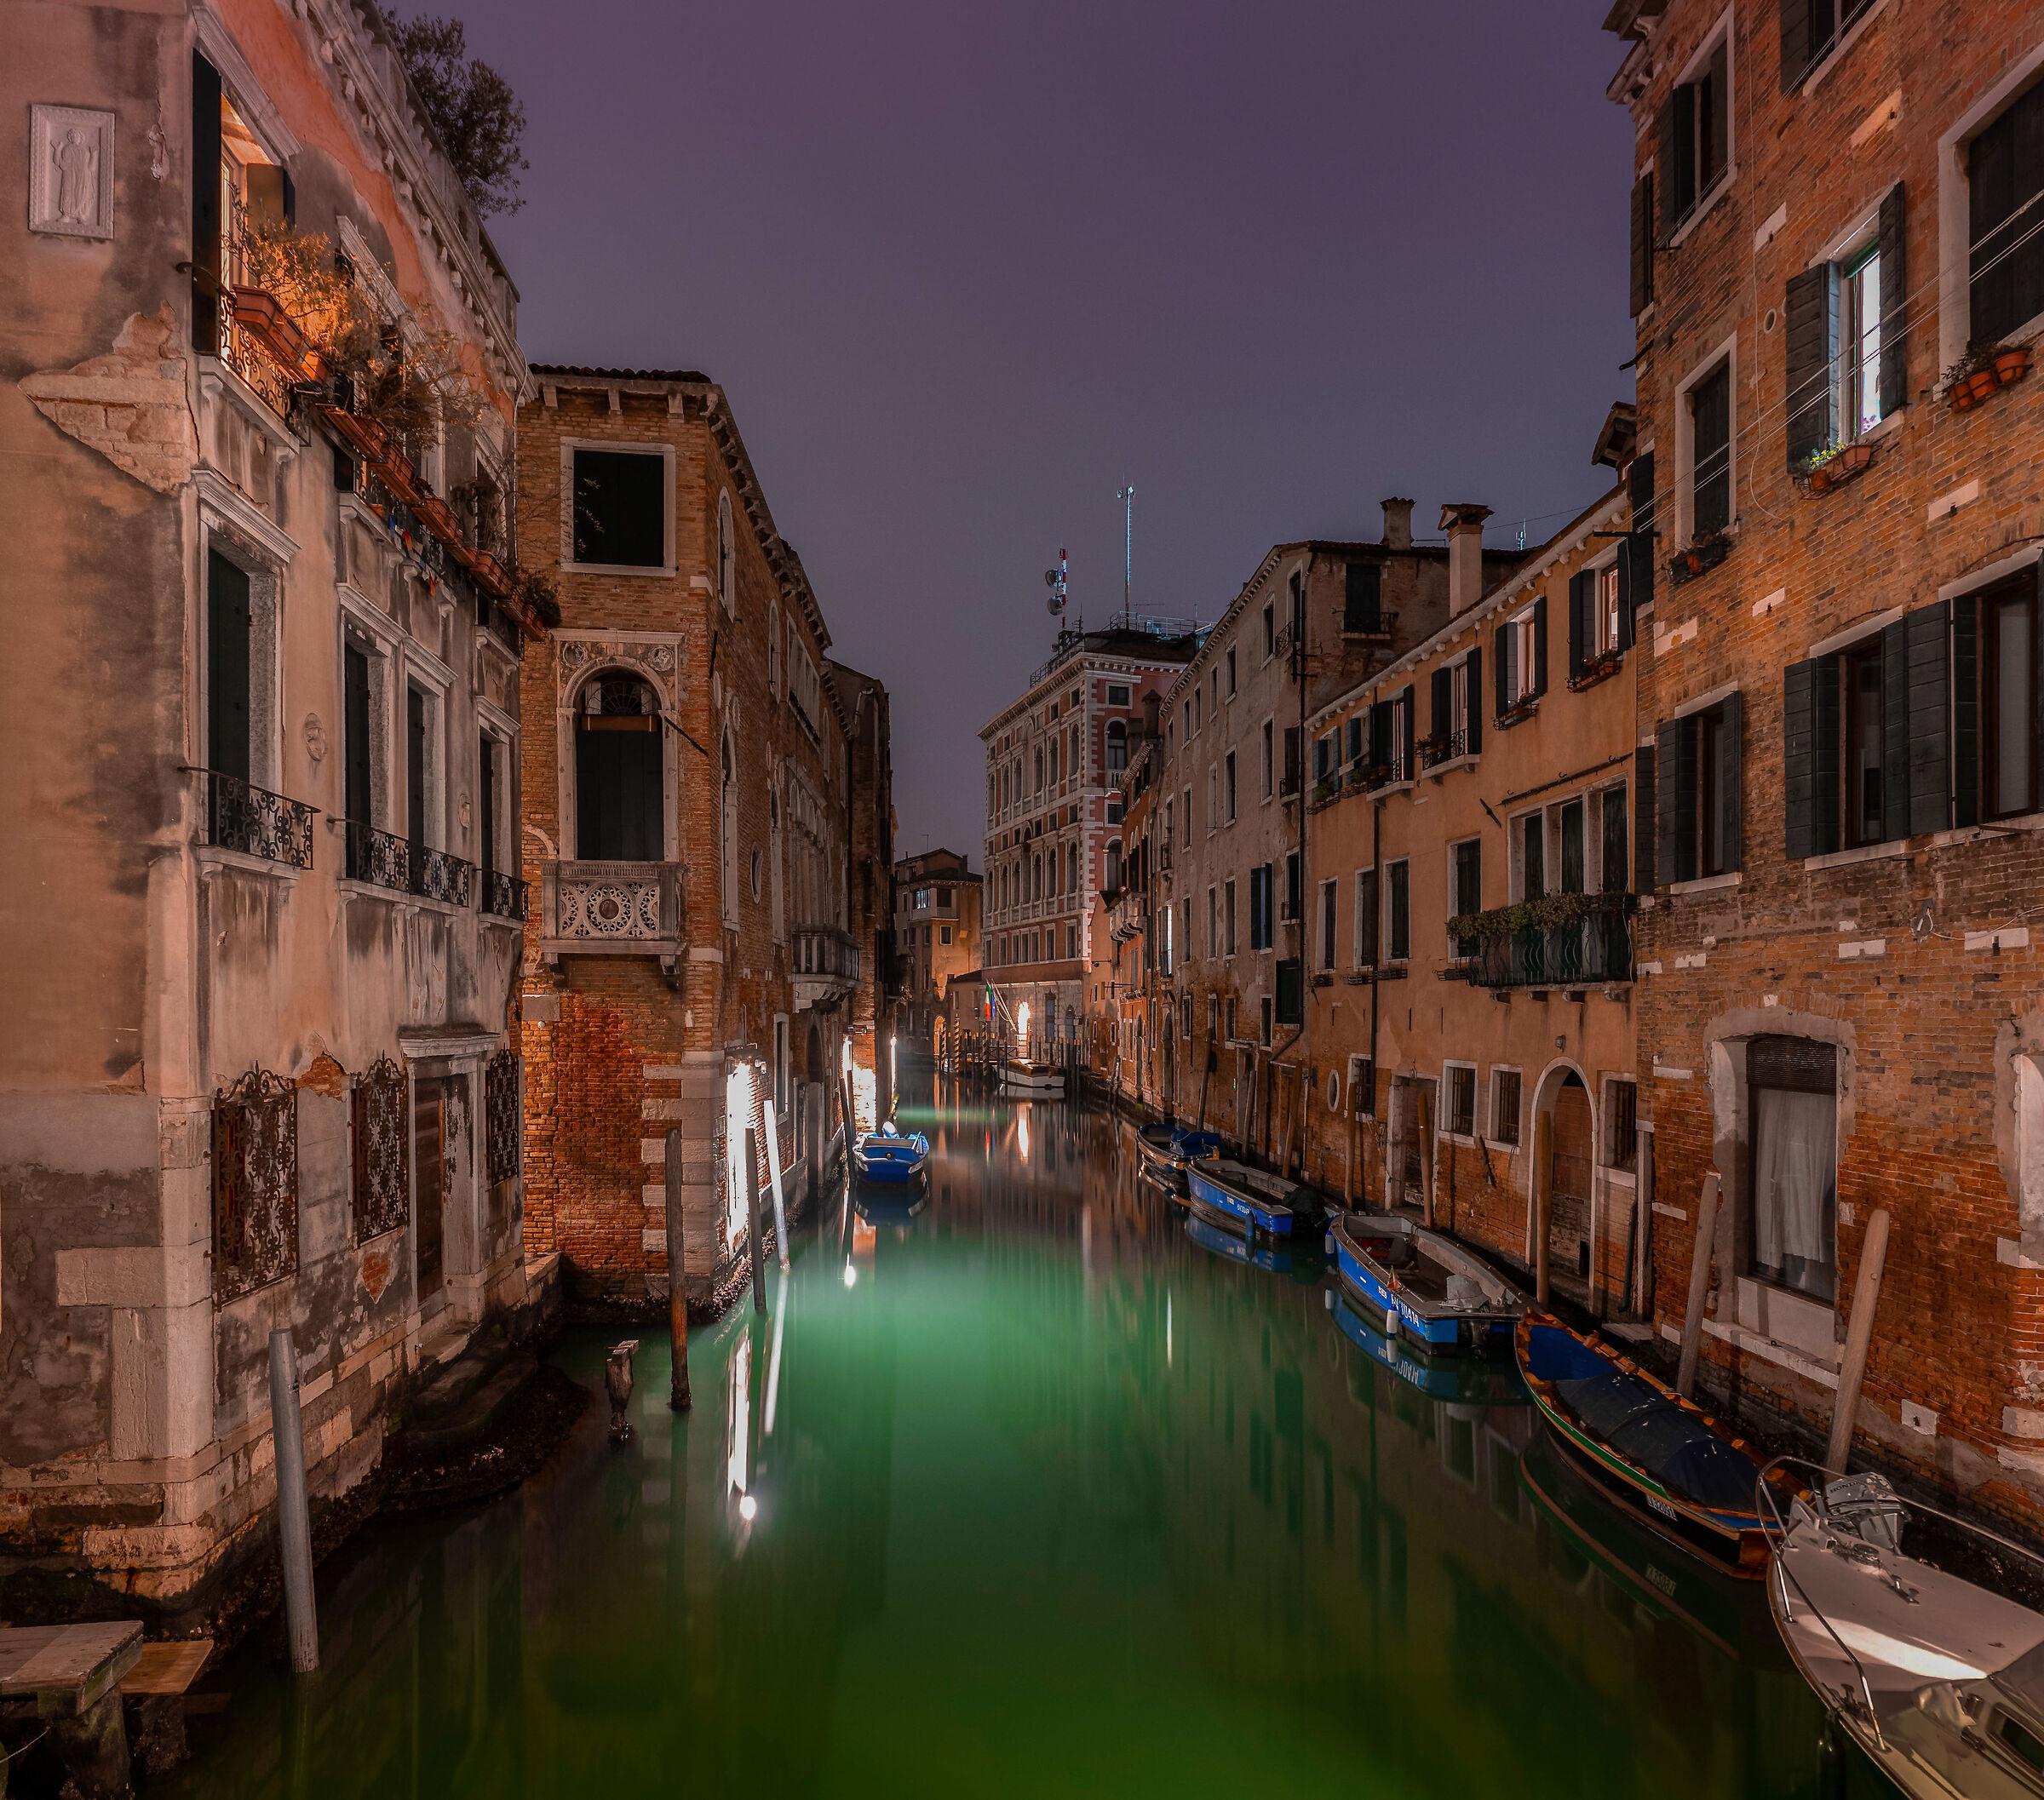 Venetian canaletto...